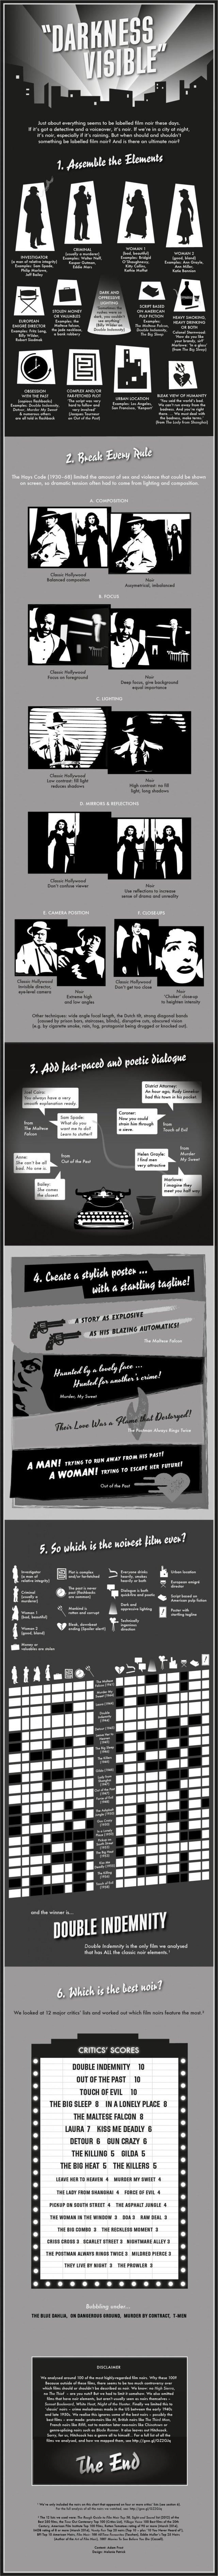 film-noir-infographic-001